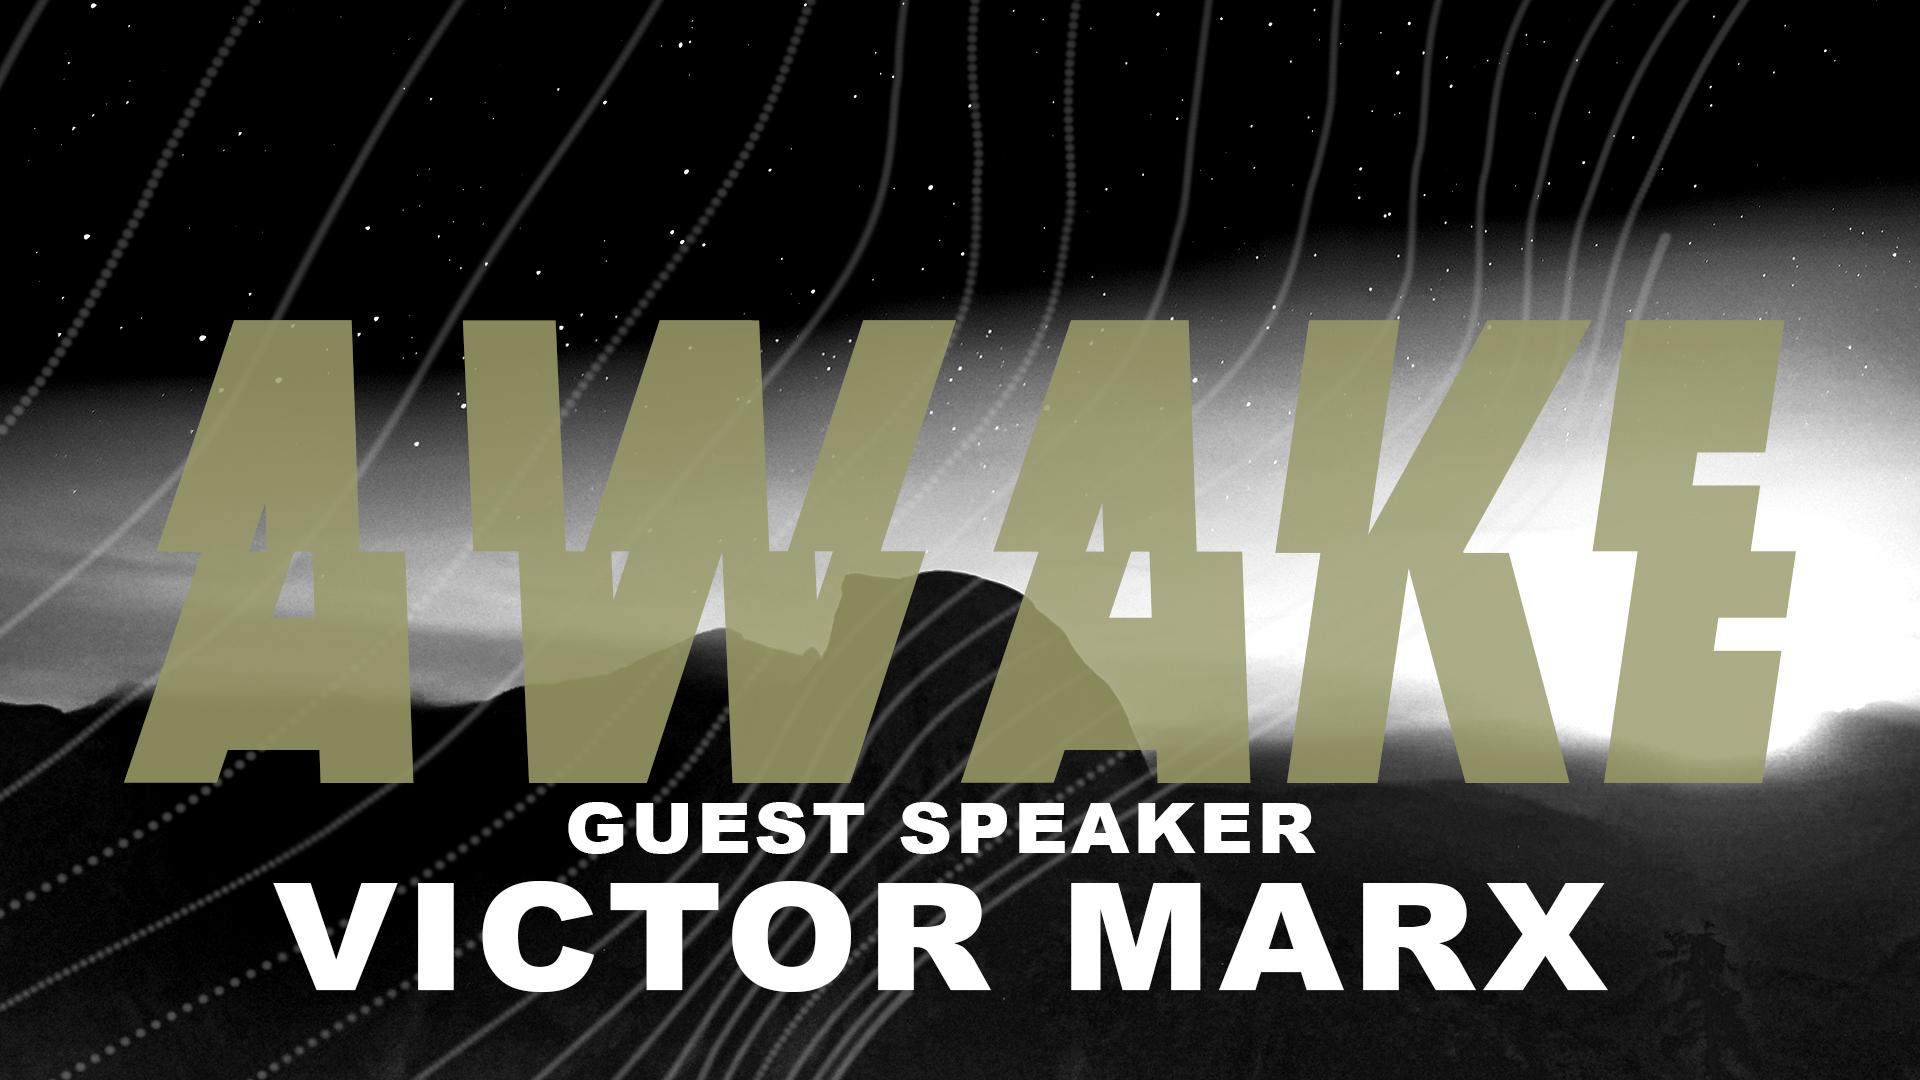 Victor Marx sermon graphic.jpg